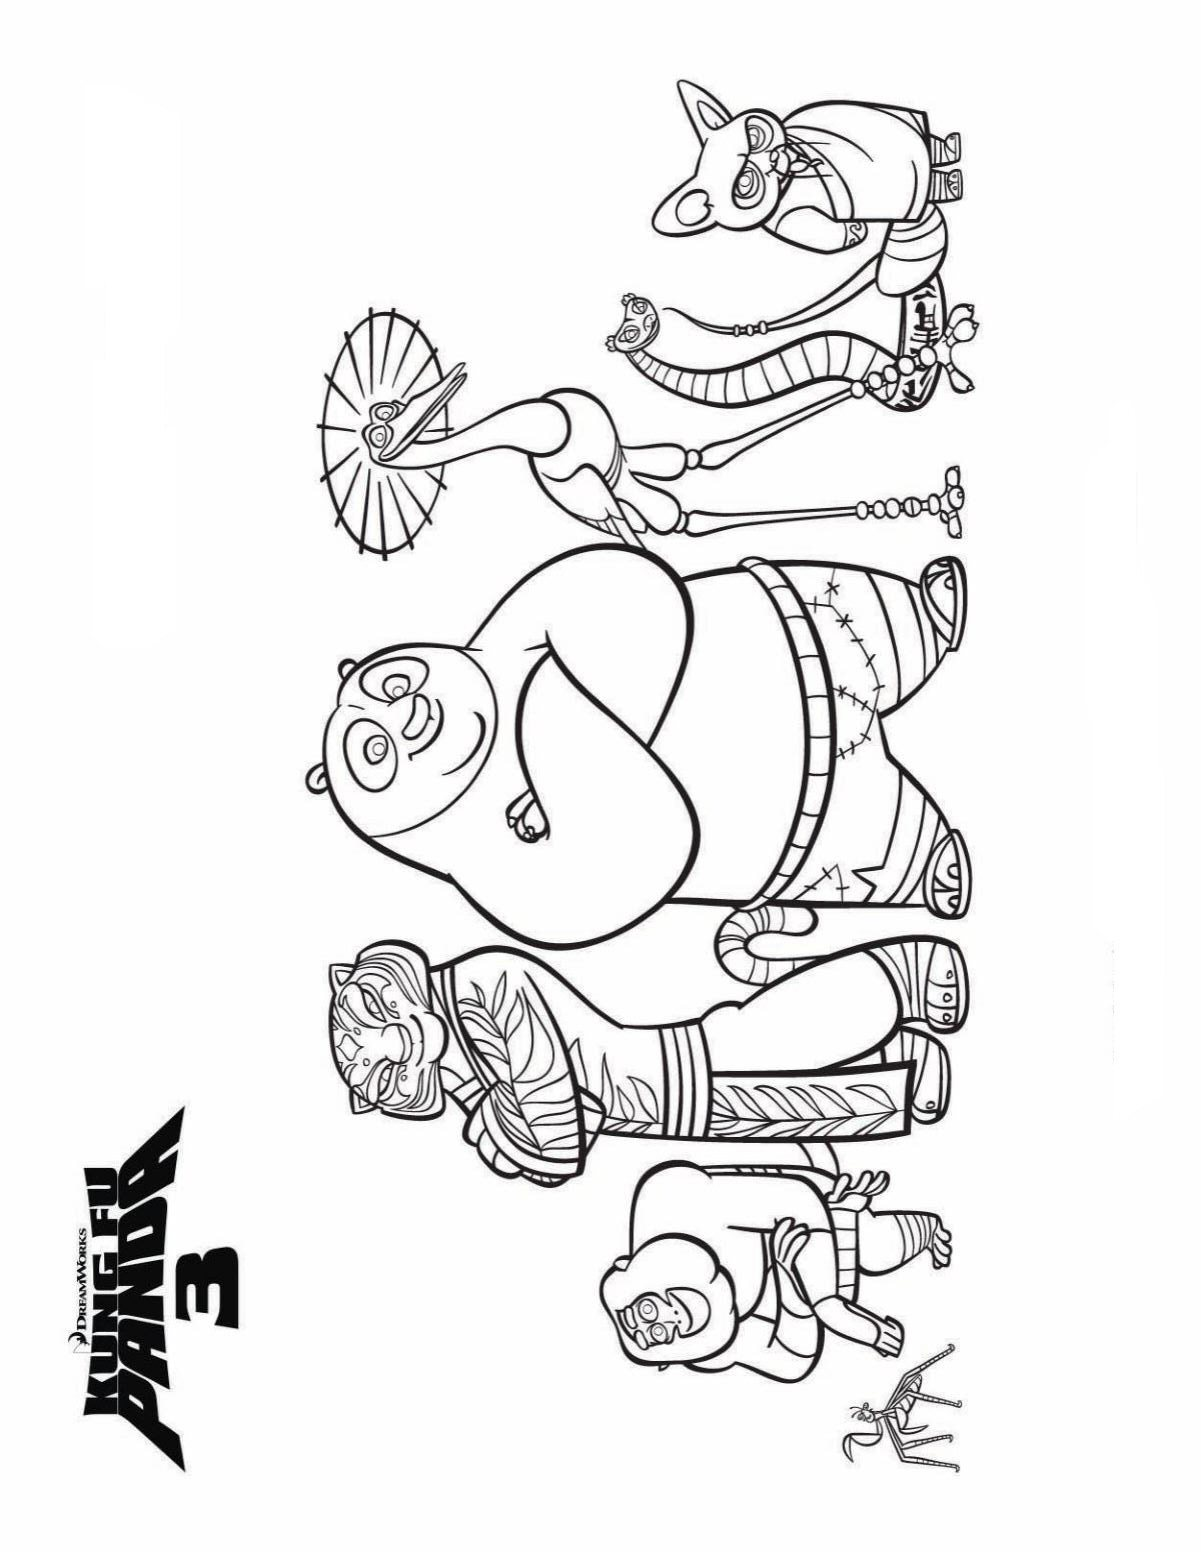 Kung fu panda 3 ausmalbilder